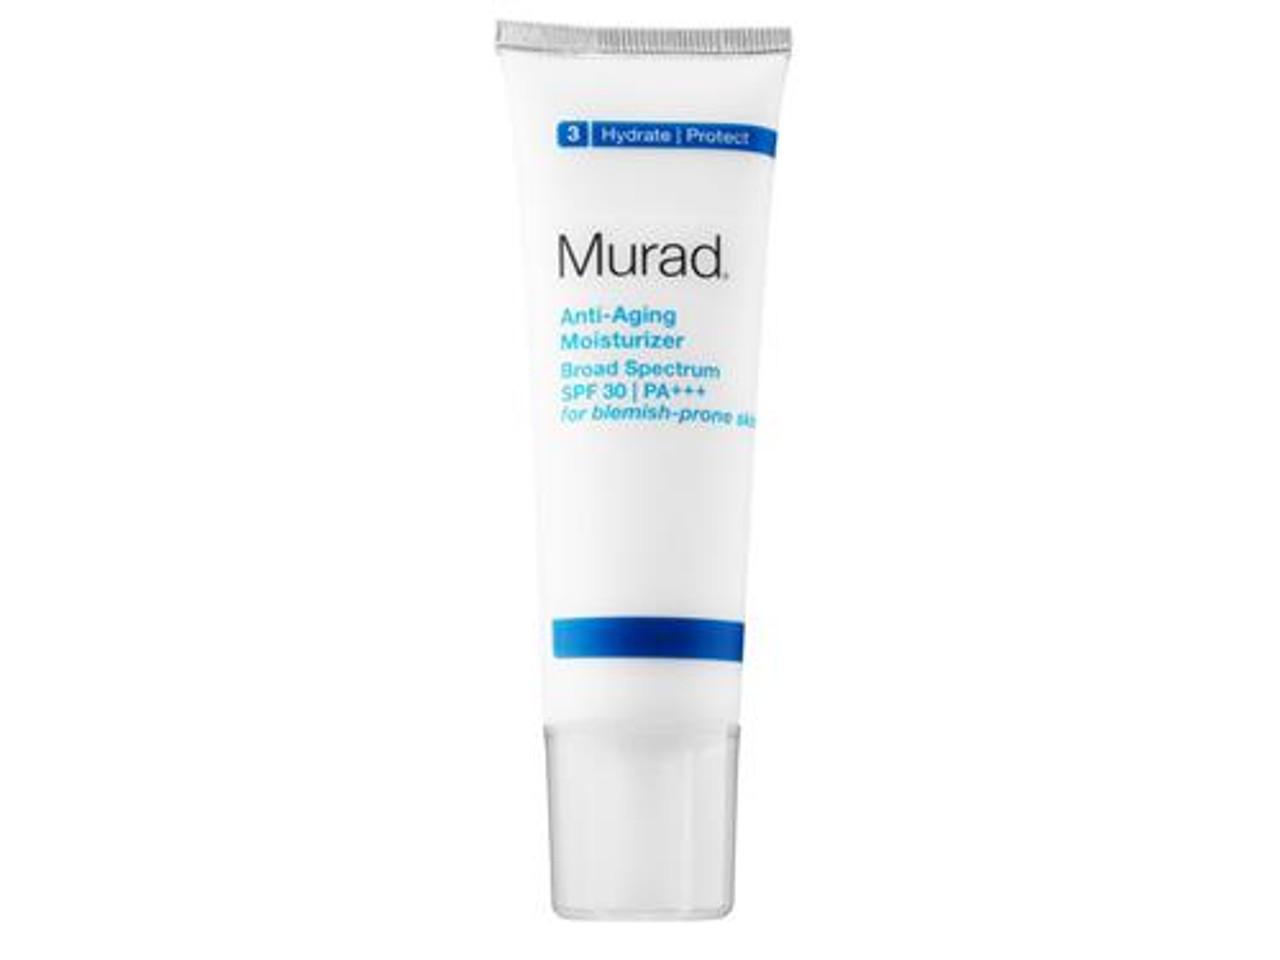 Murad Anti-Aging Moisturizer SPF 30 1.7 oz